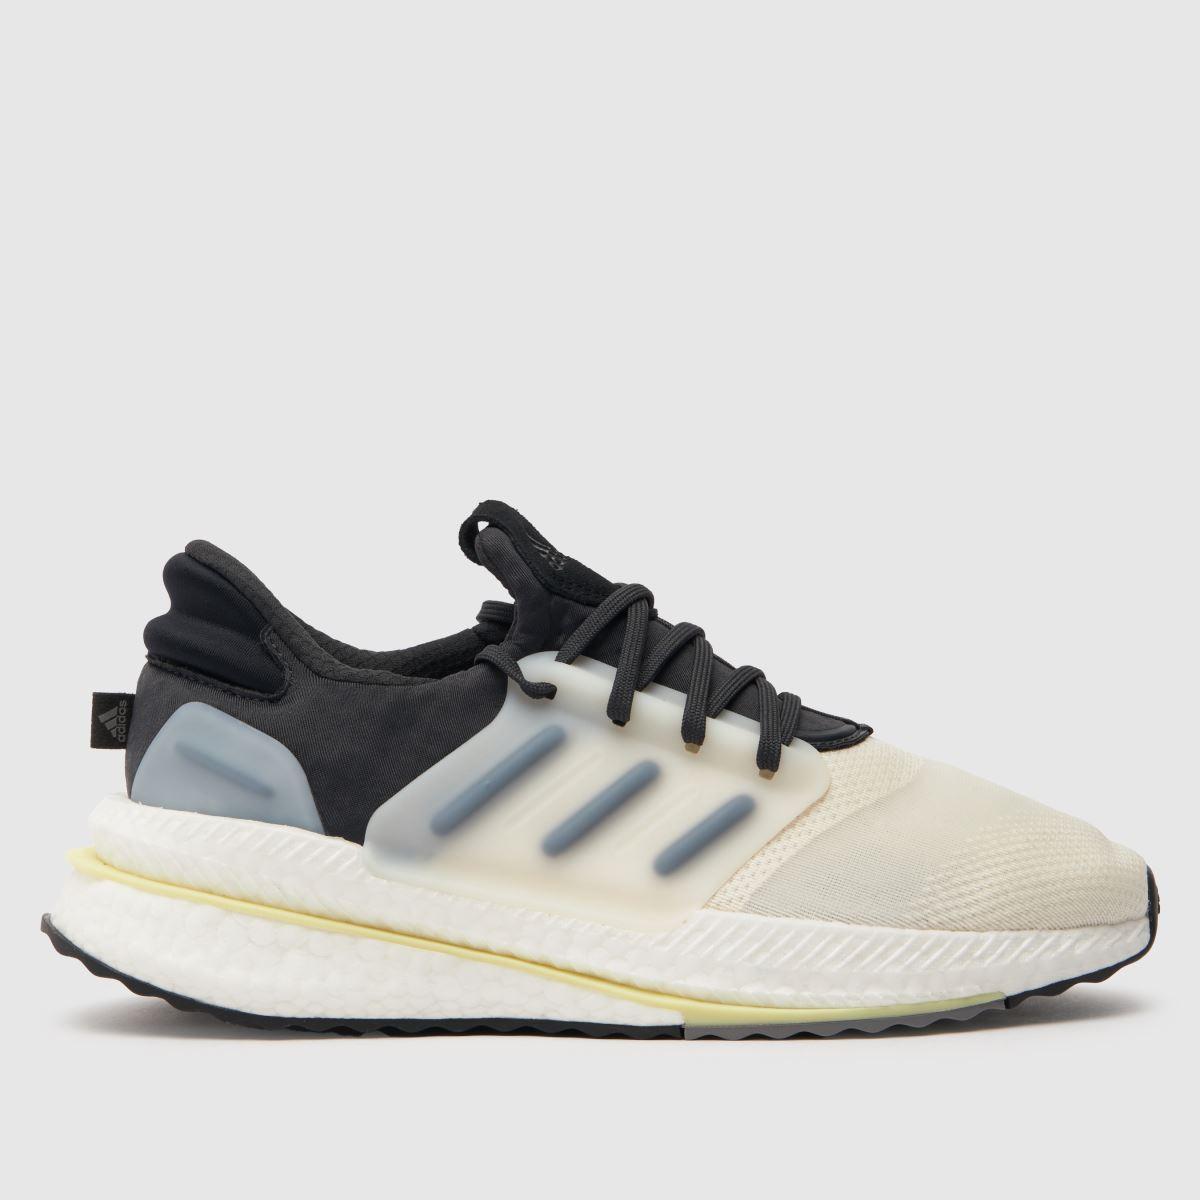 Adidas White & Black Sl 7200 Pride Trainers